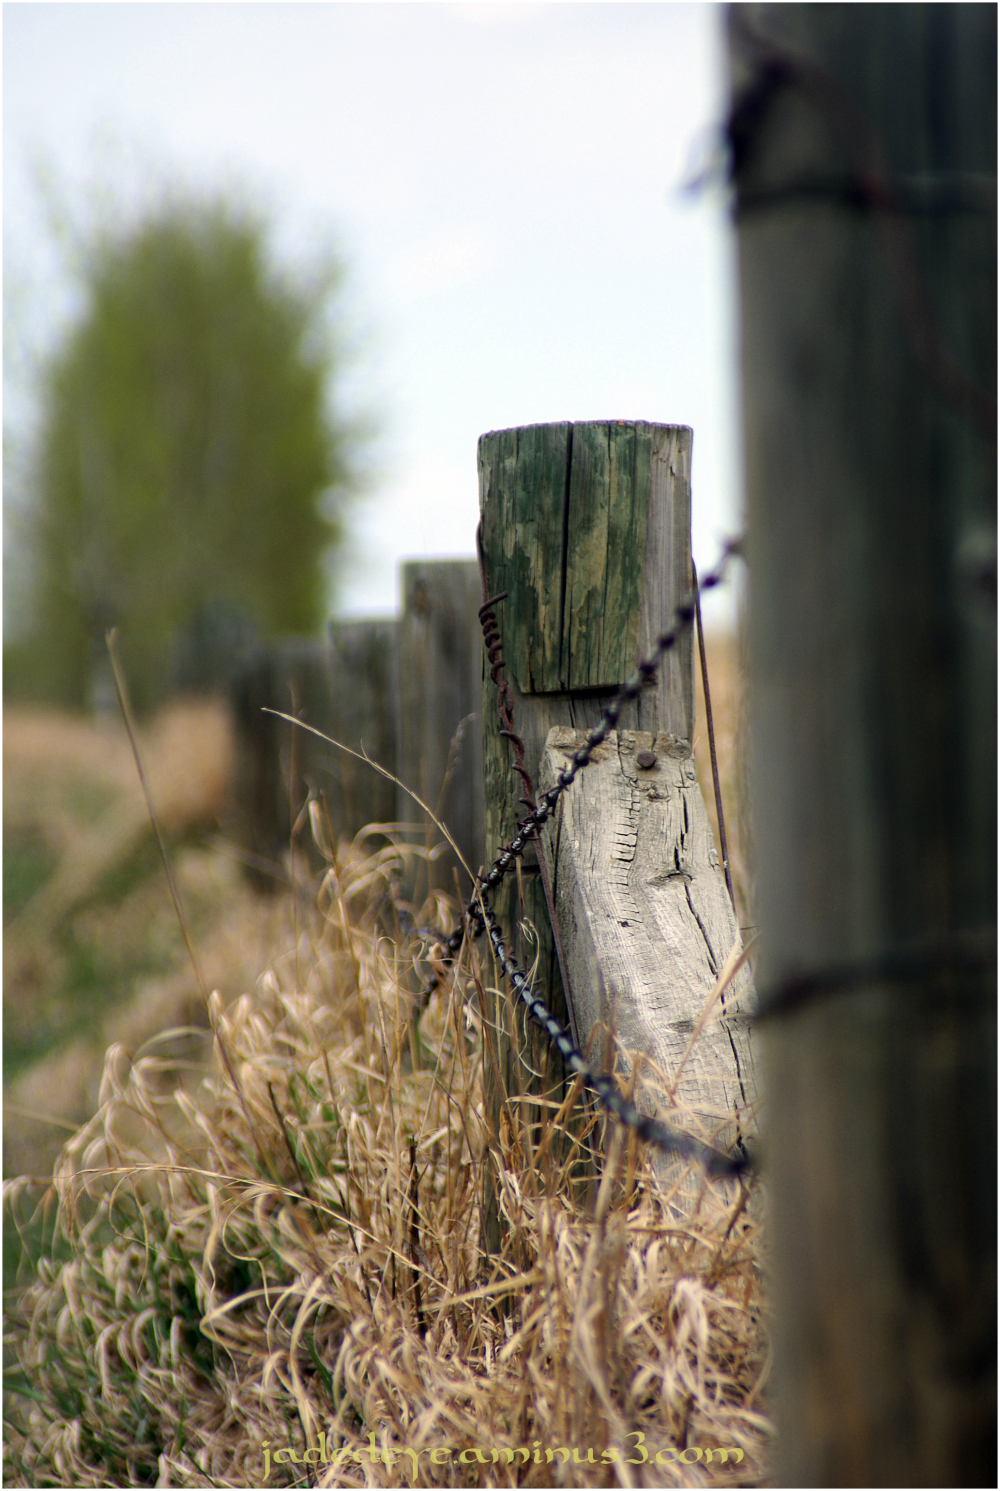 Prairie Fence Line #2